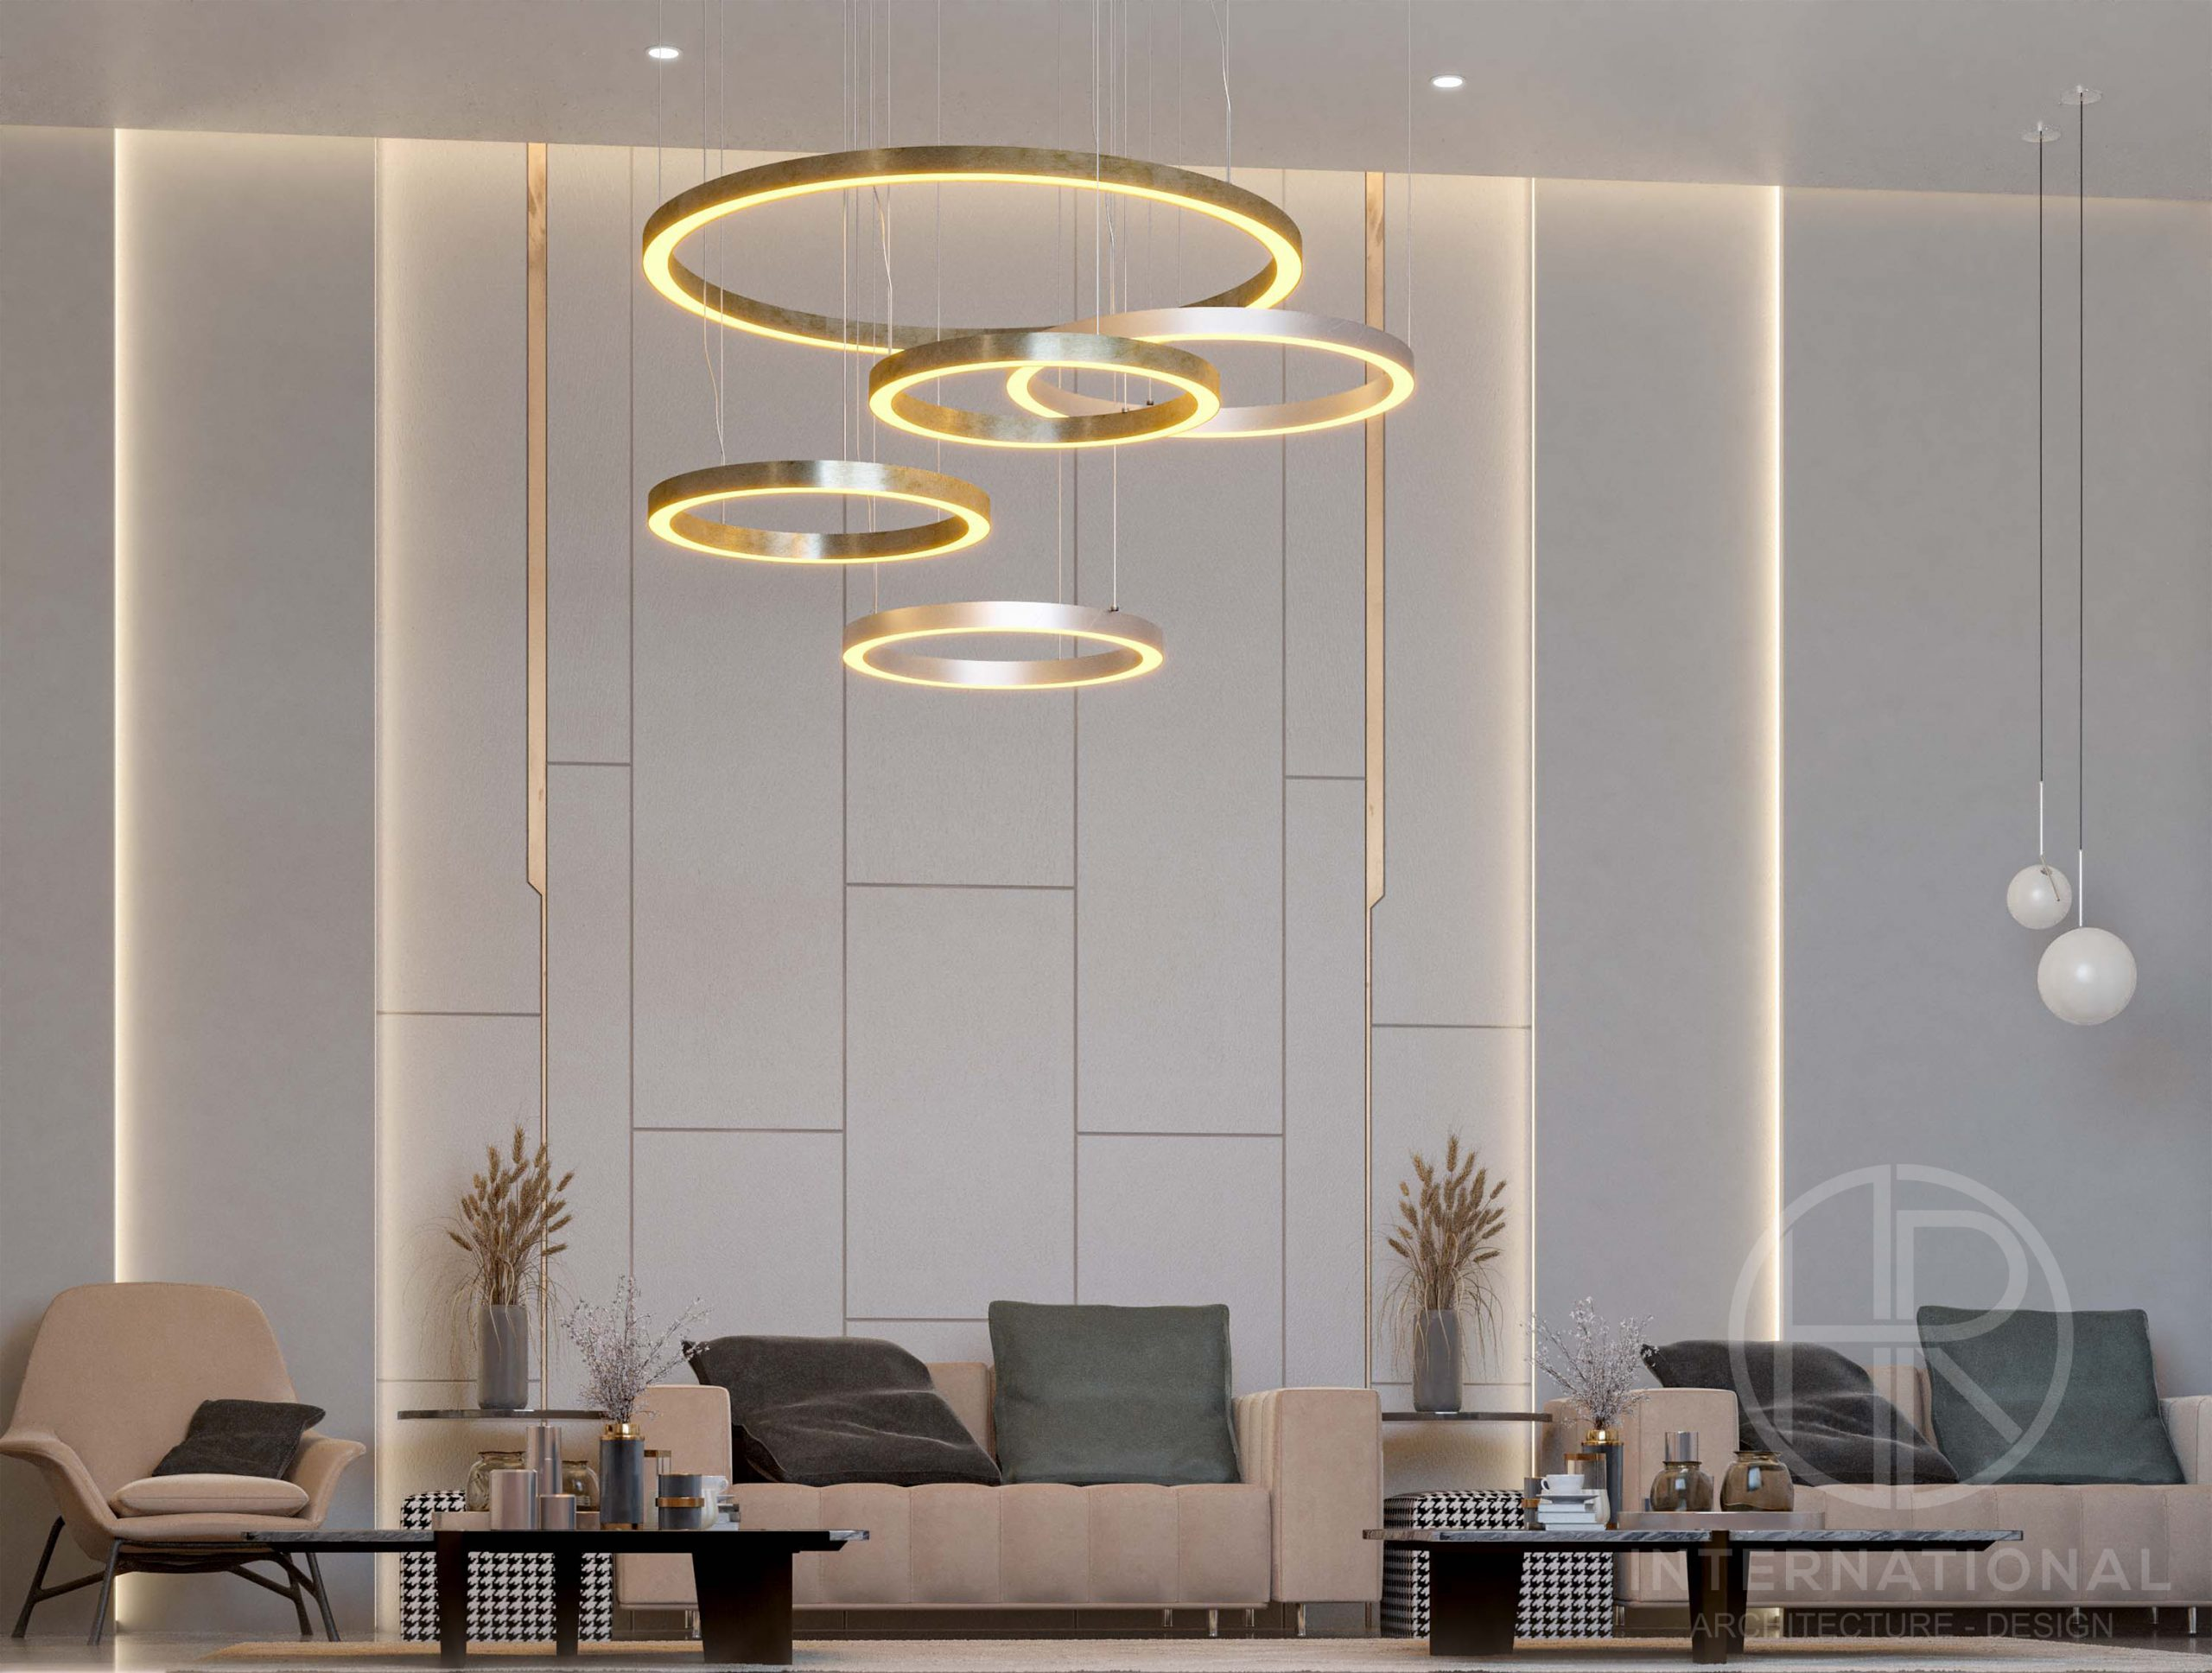 - golden wall design - plants - lighting work